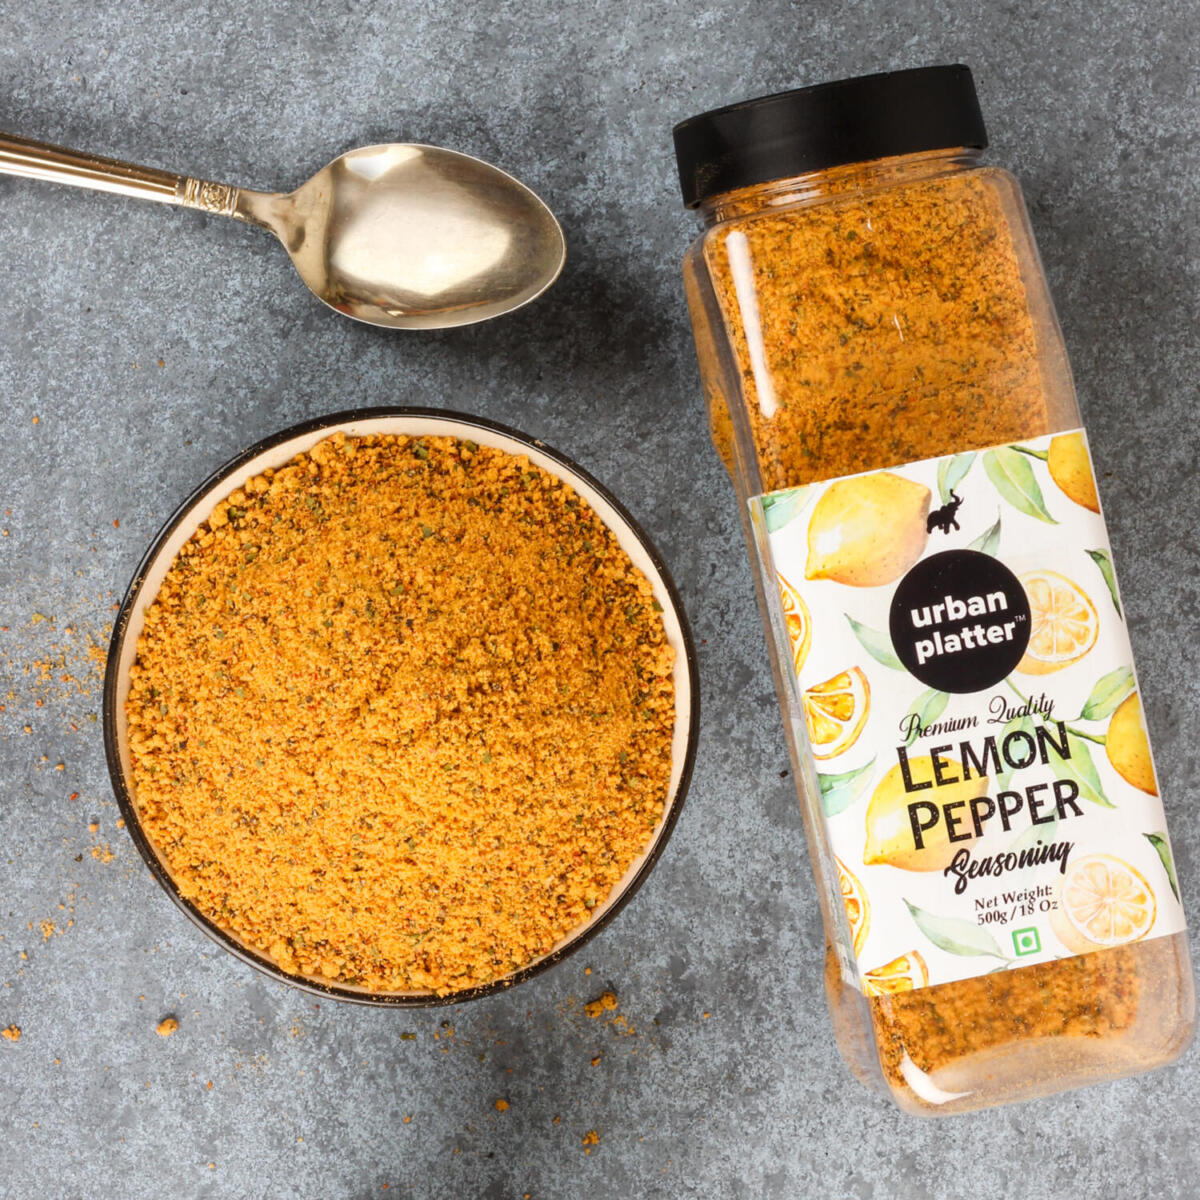 Urban Platter Lemon Pepper Seasoning Mix Shaker Jar, 500g / 18oz ...